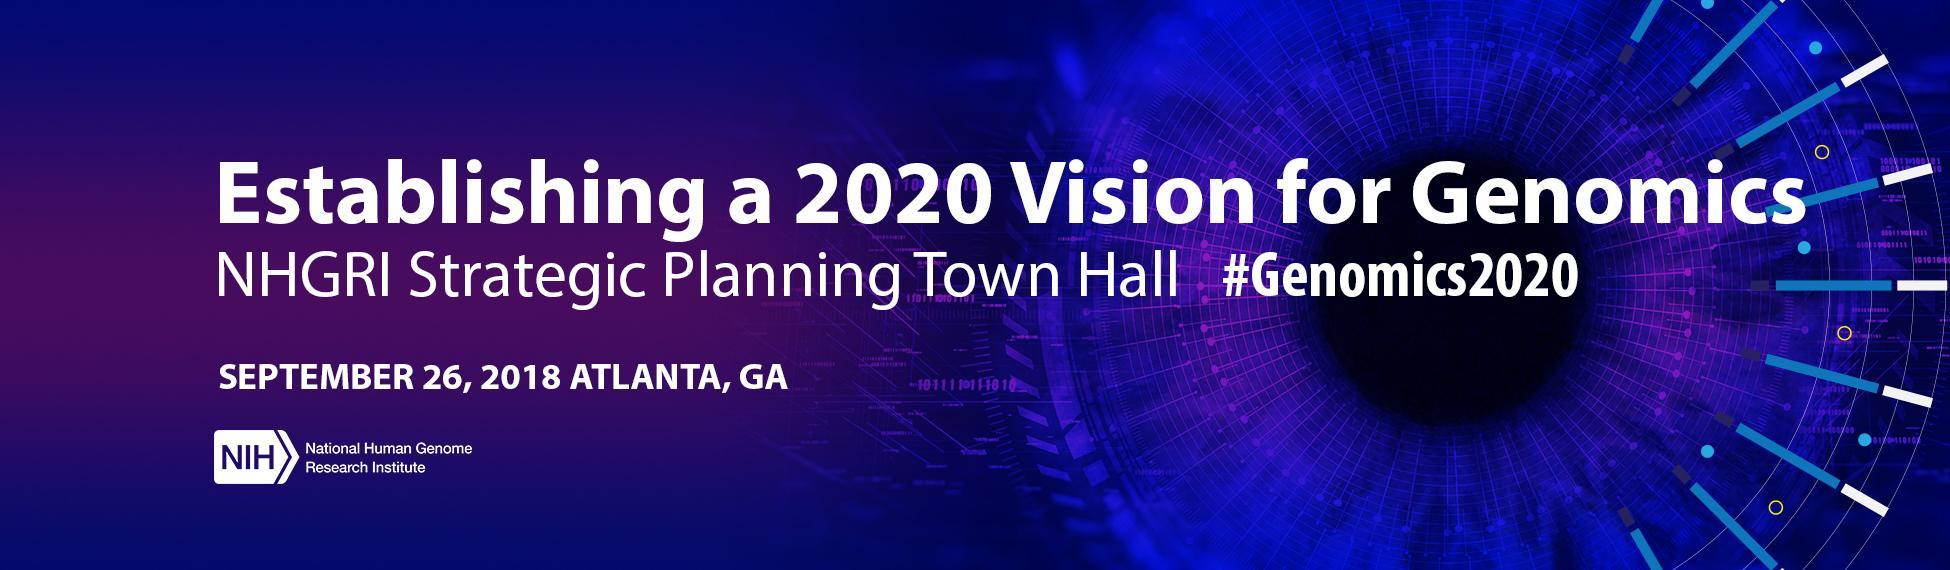 Establishing a 2020 Vision for Genomics